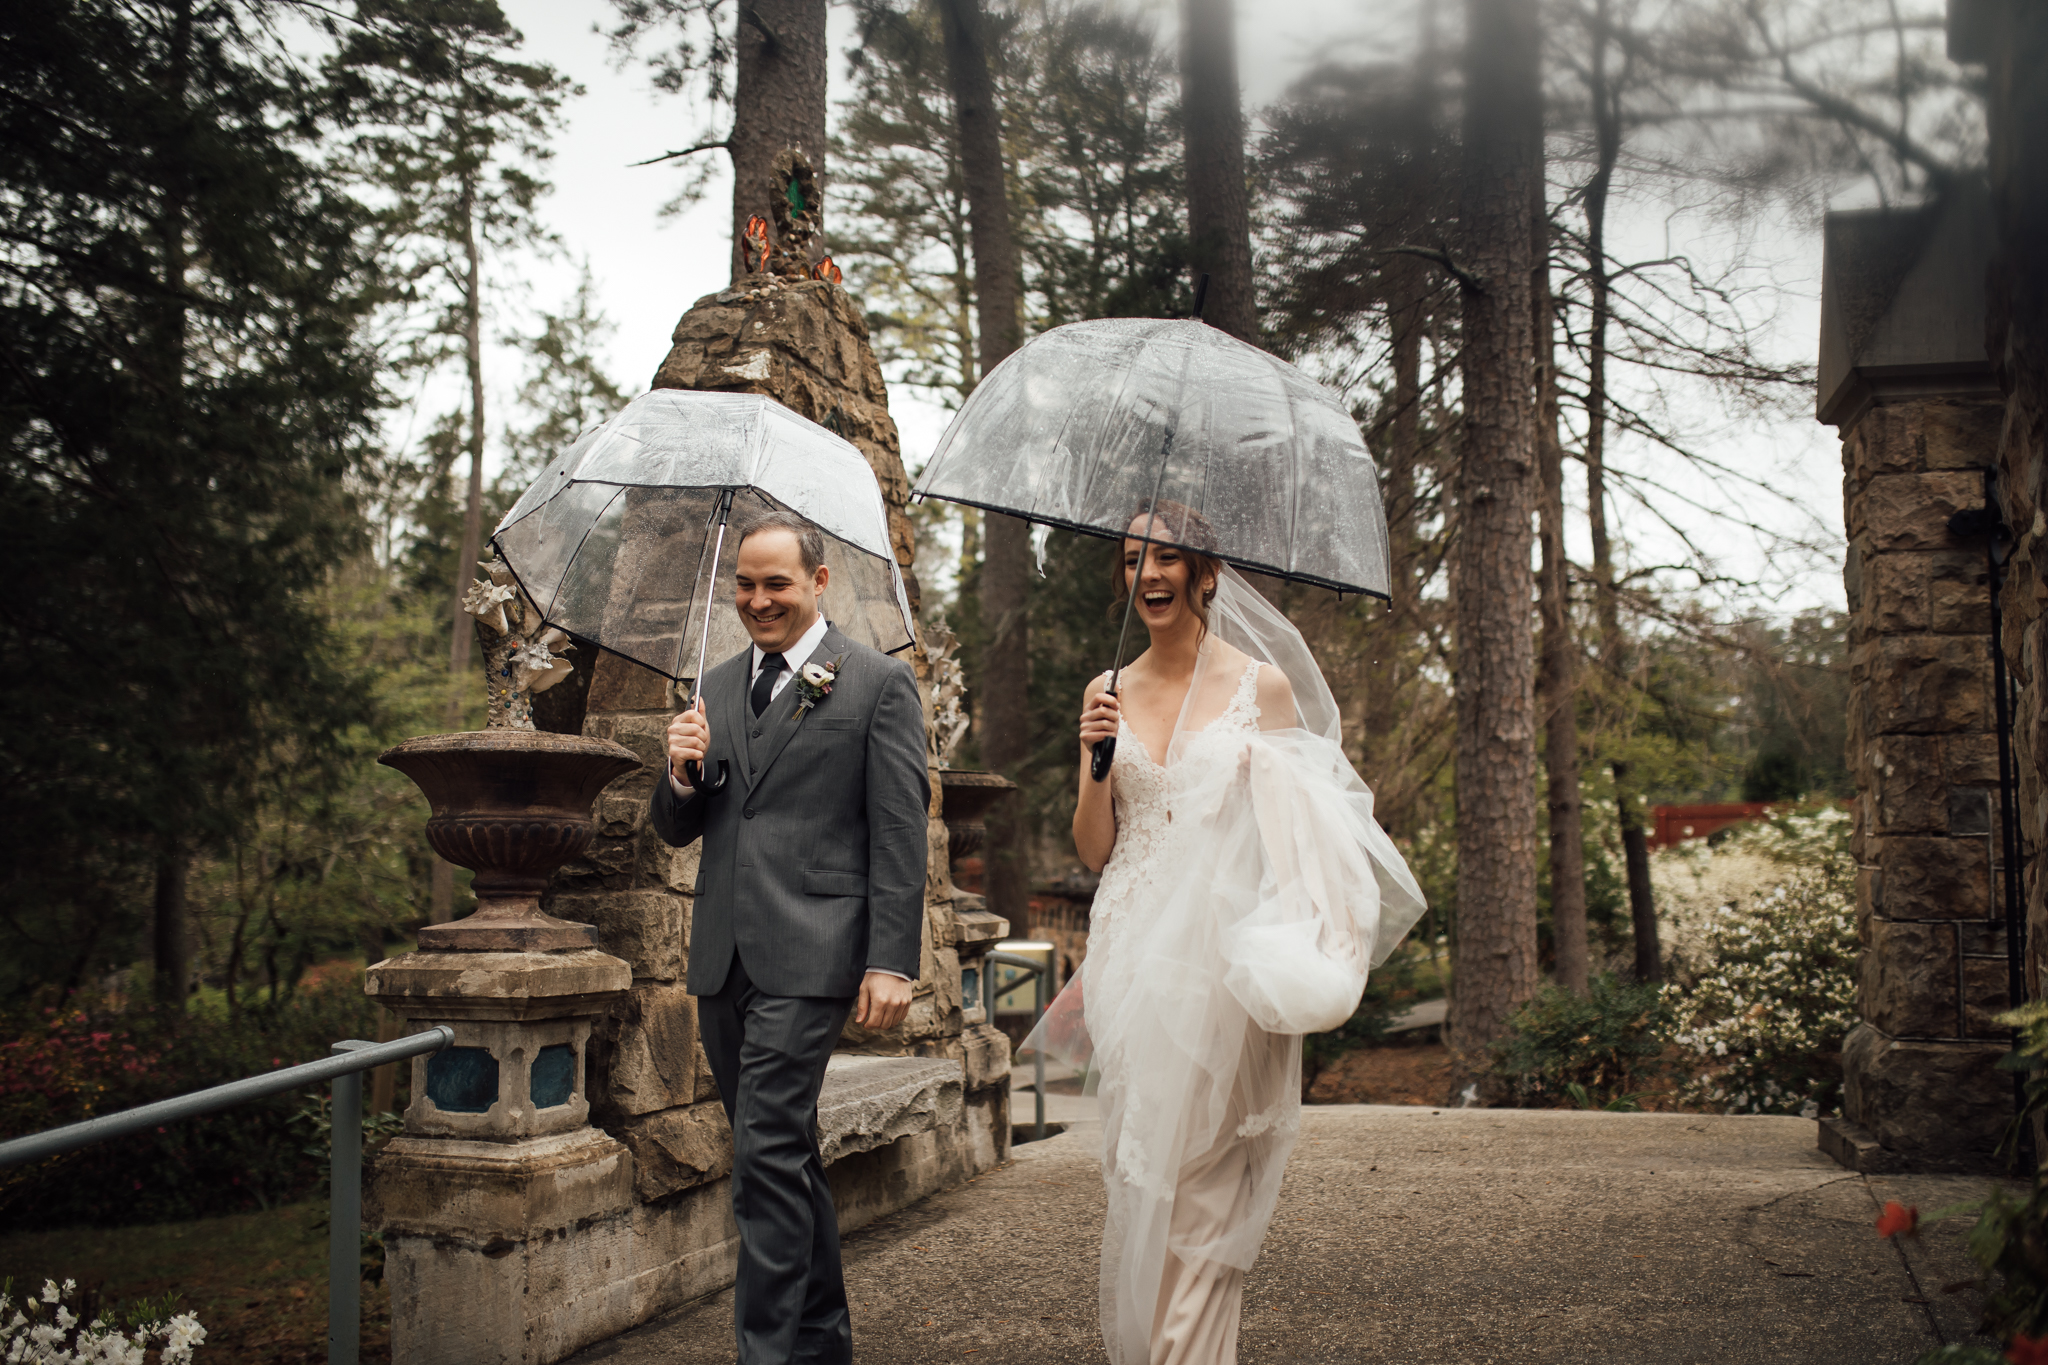 birmingham-alabama-wedding-photographer-laura-terry-the-warmth-around-you (55 of 110).jpg